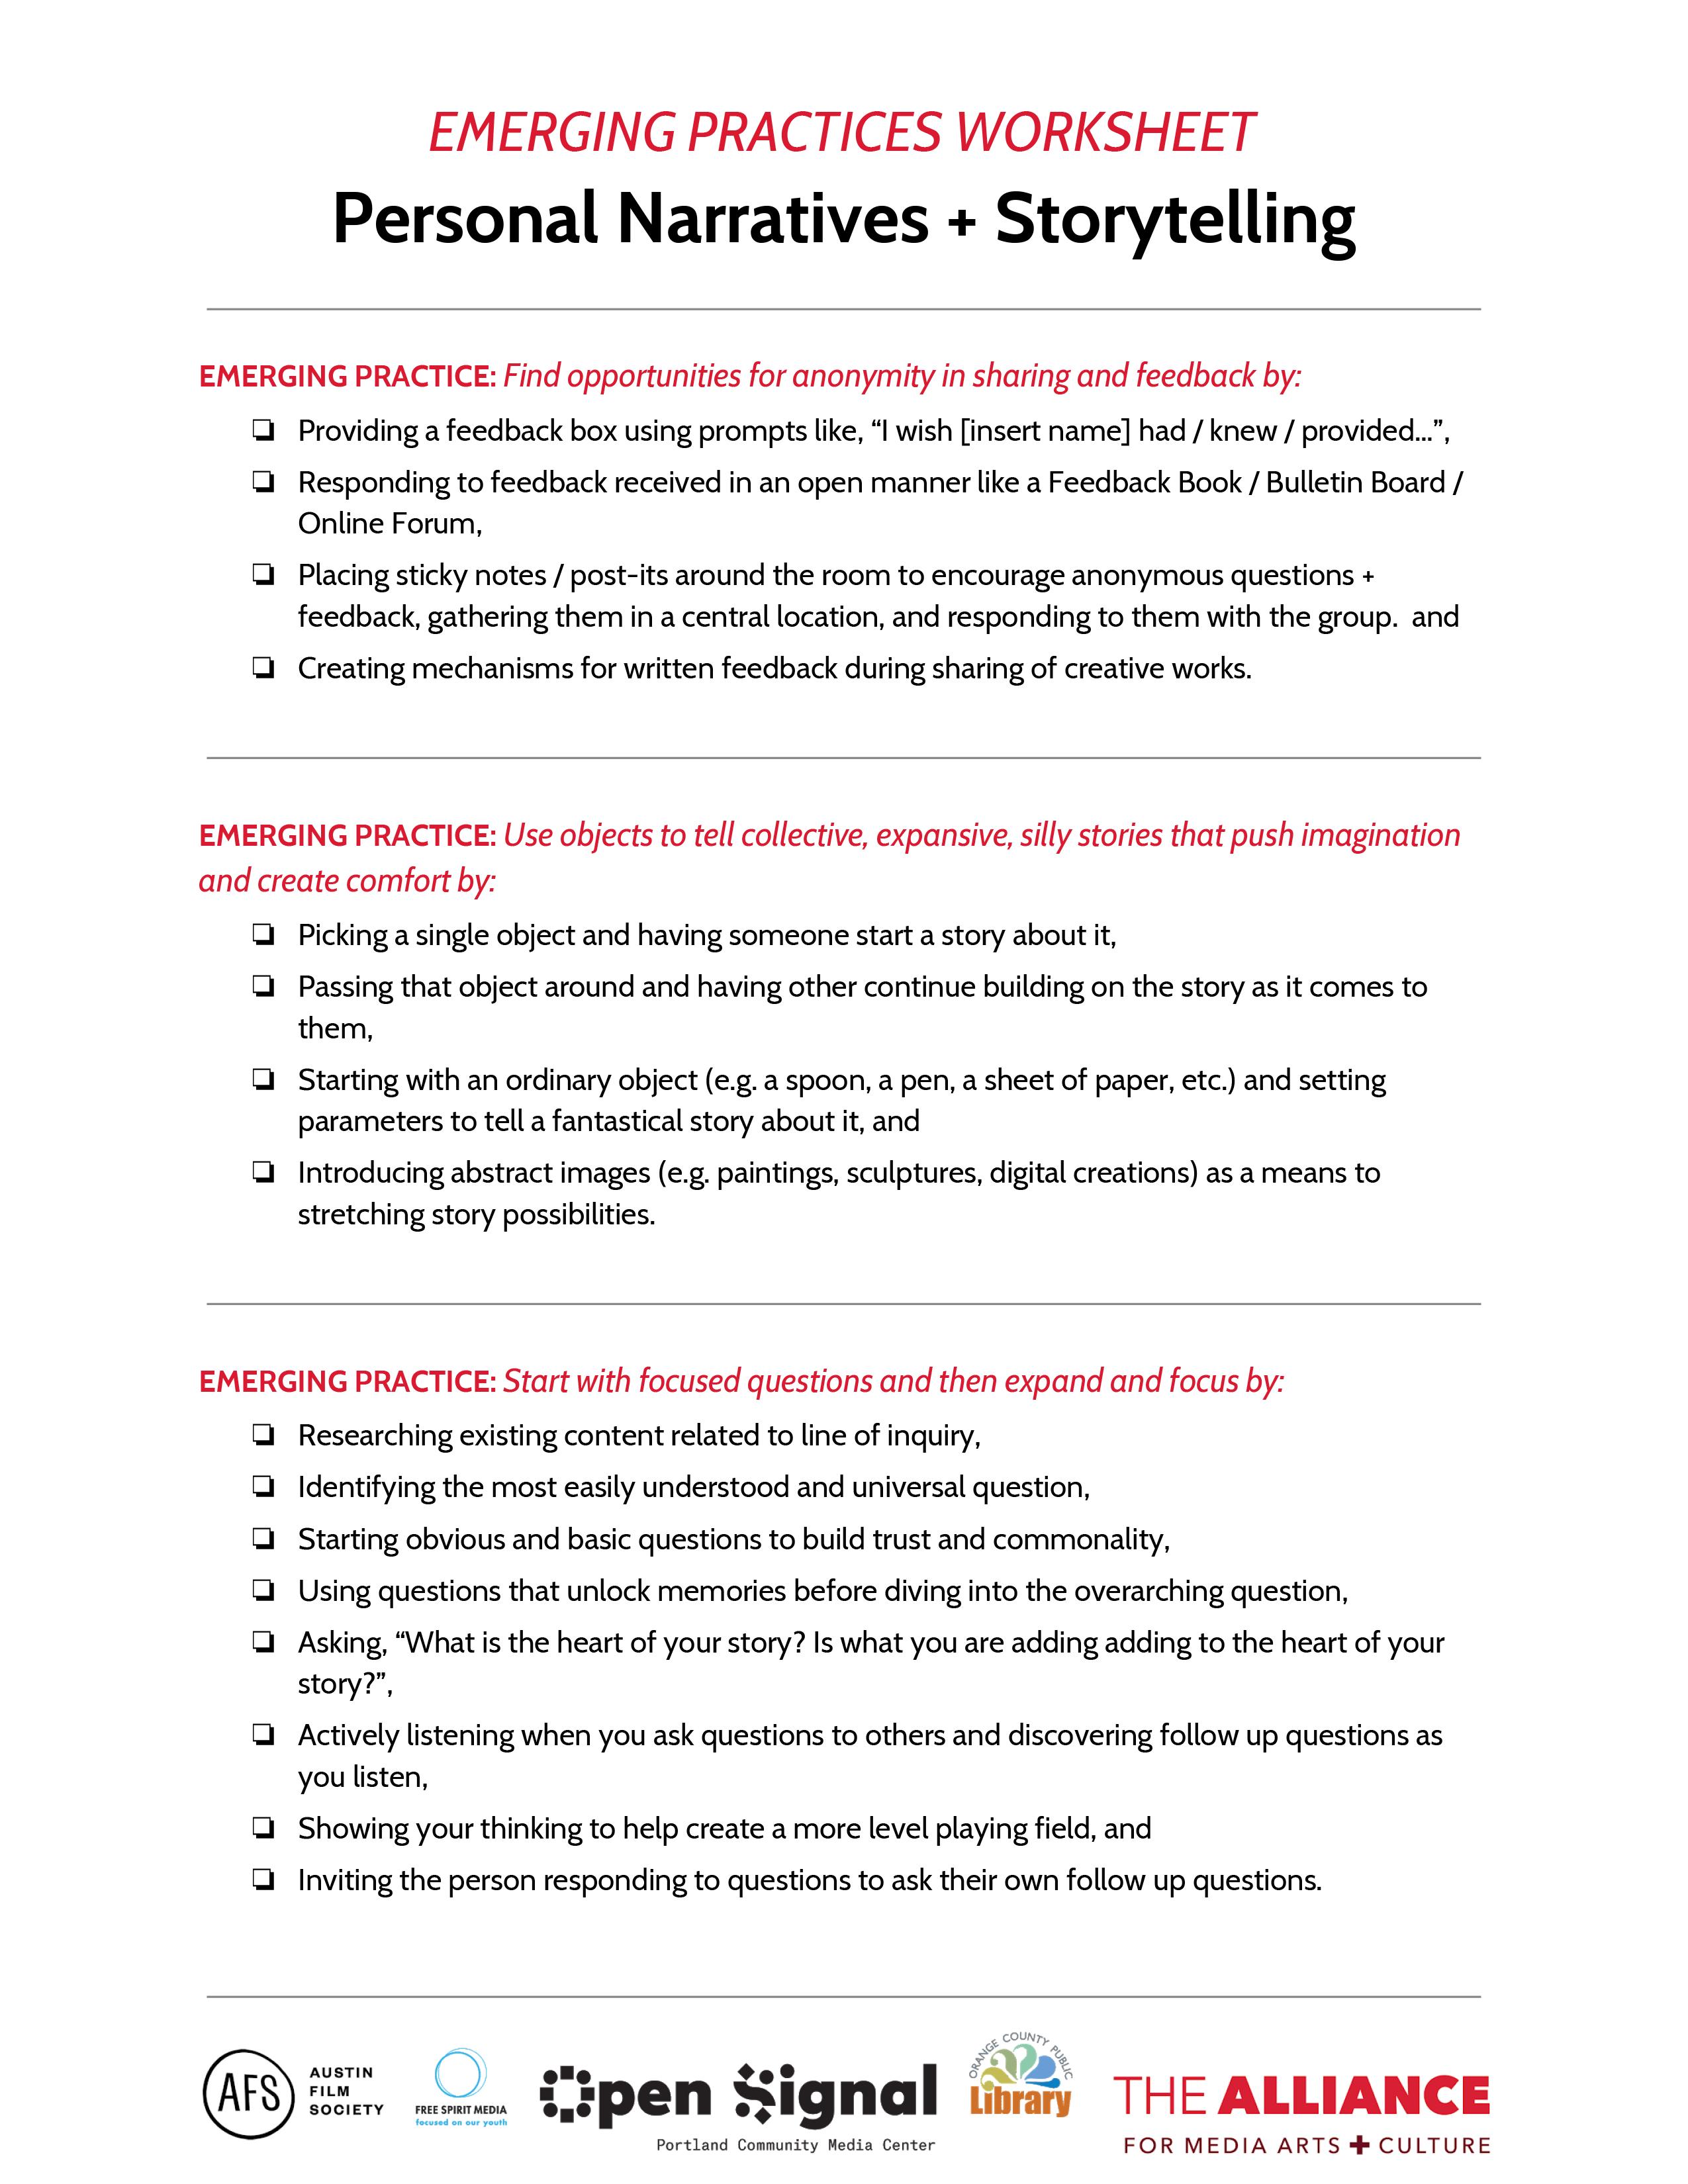 Worksheet Personal Narrative Storytelling 4 The Alliance